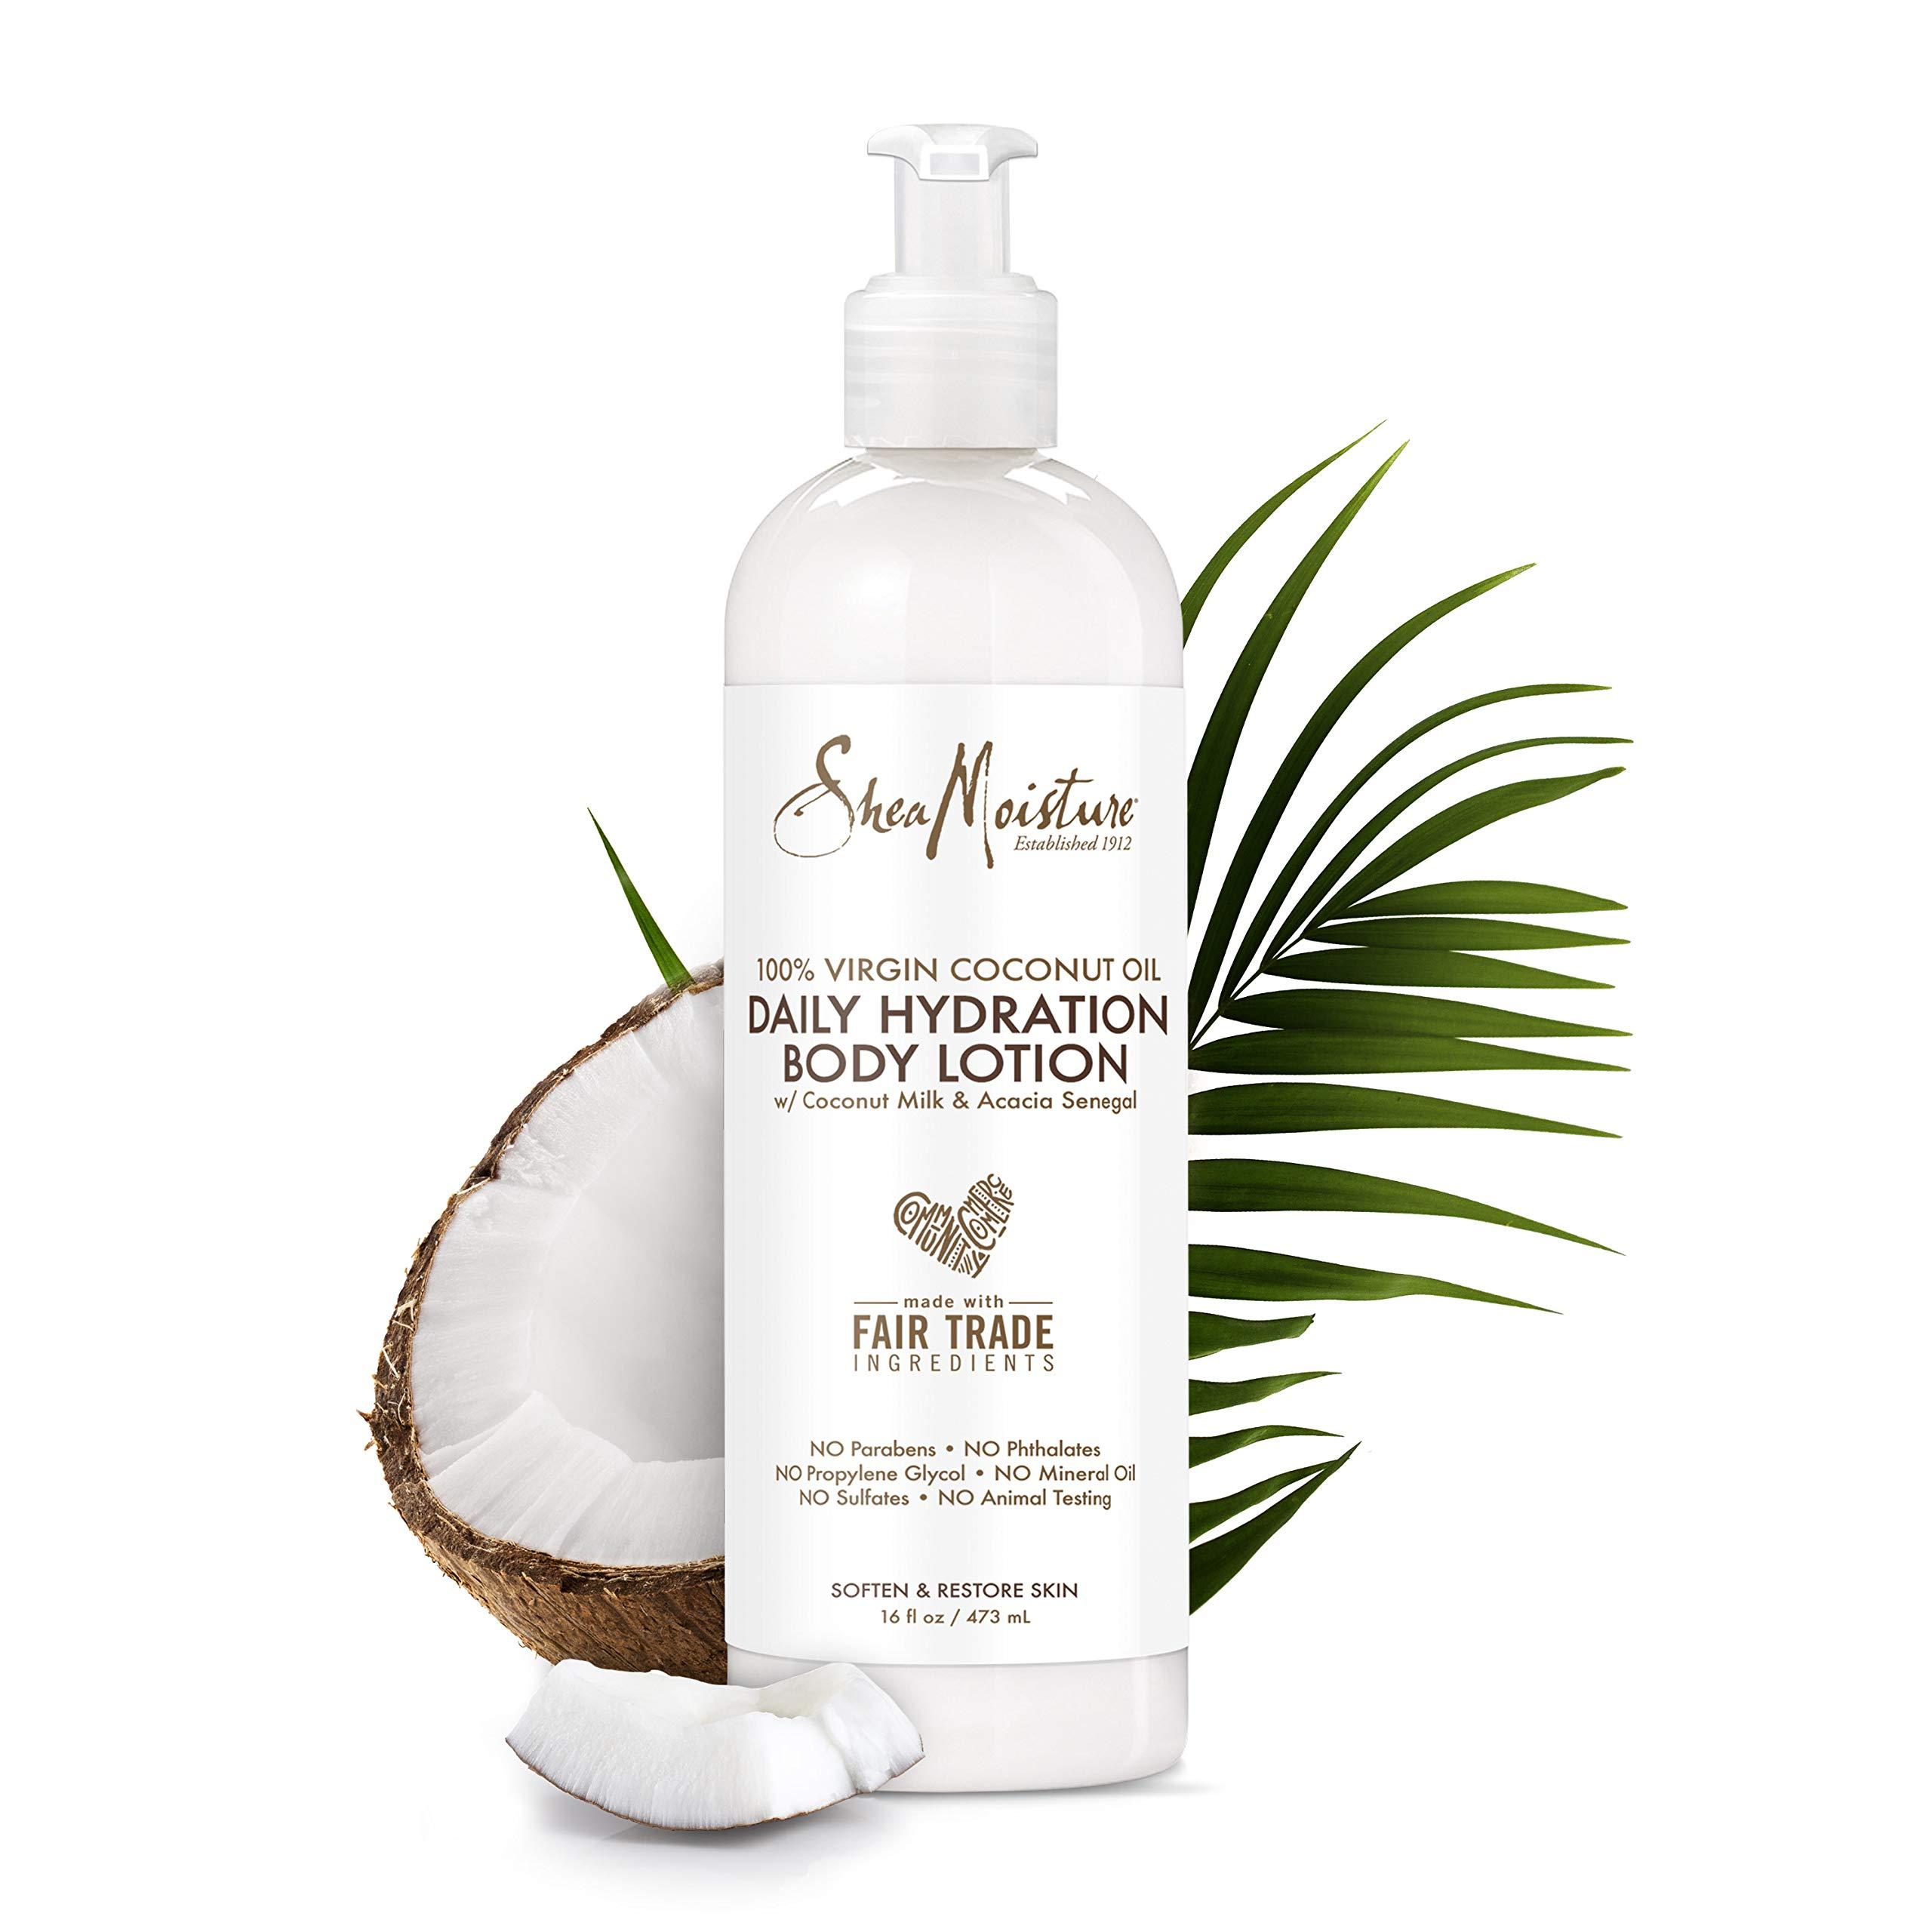 SheaMoisture 100% Virgin Coconut Oil Daily Hydration Body Lotion, 16 Ounces by Shea Moisture